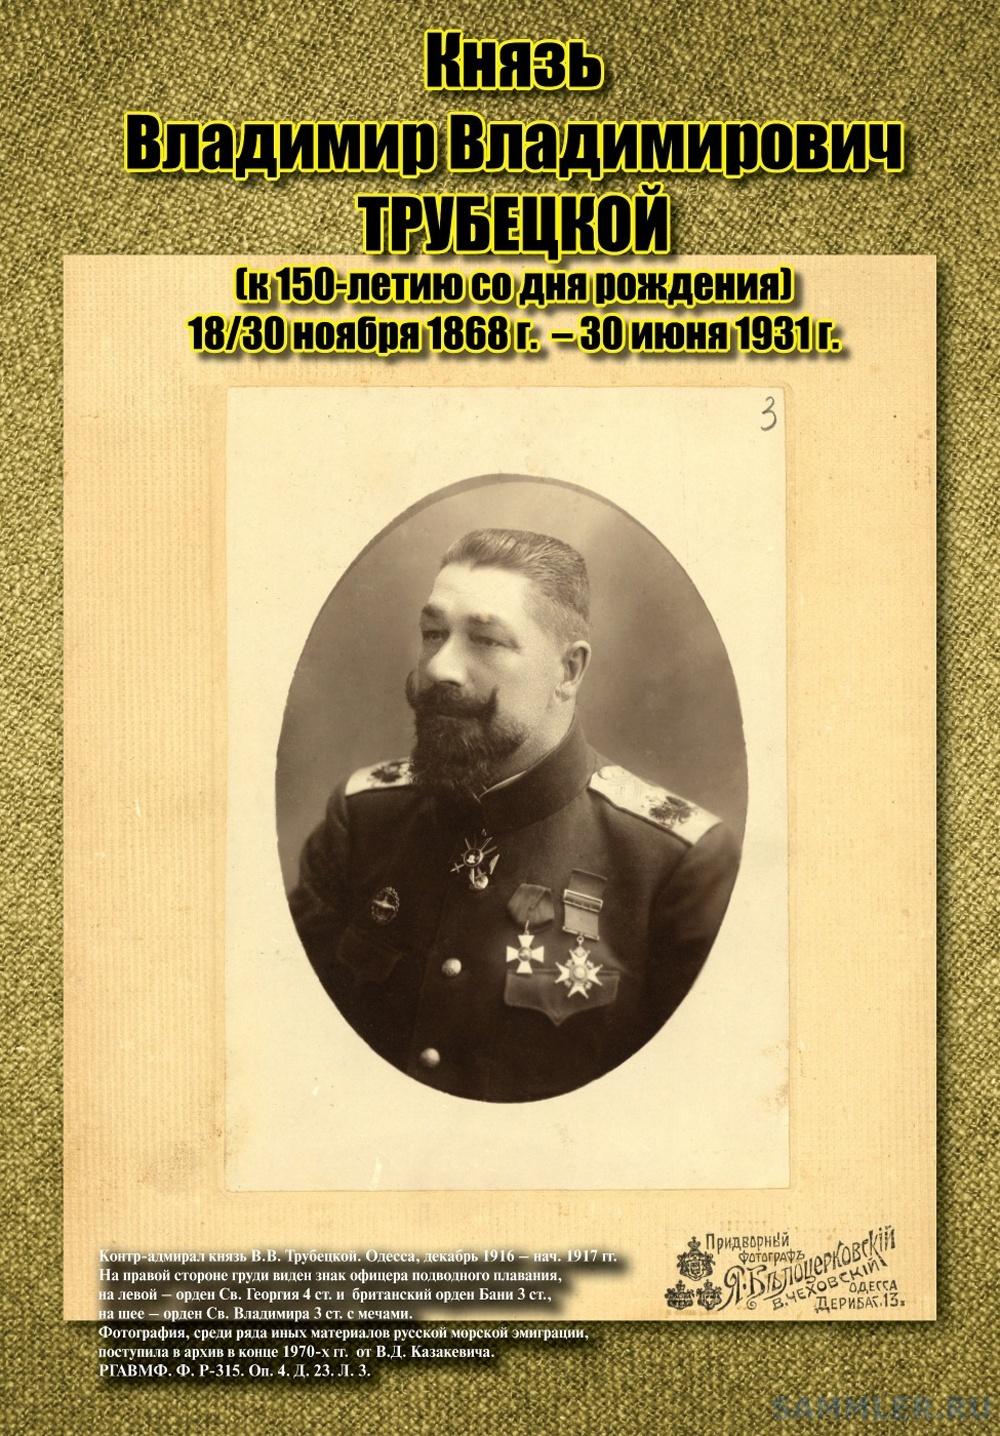 Трубецкой_Владимир_Владимирович17 (2).jpg